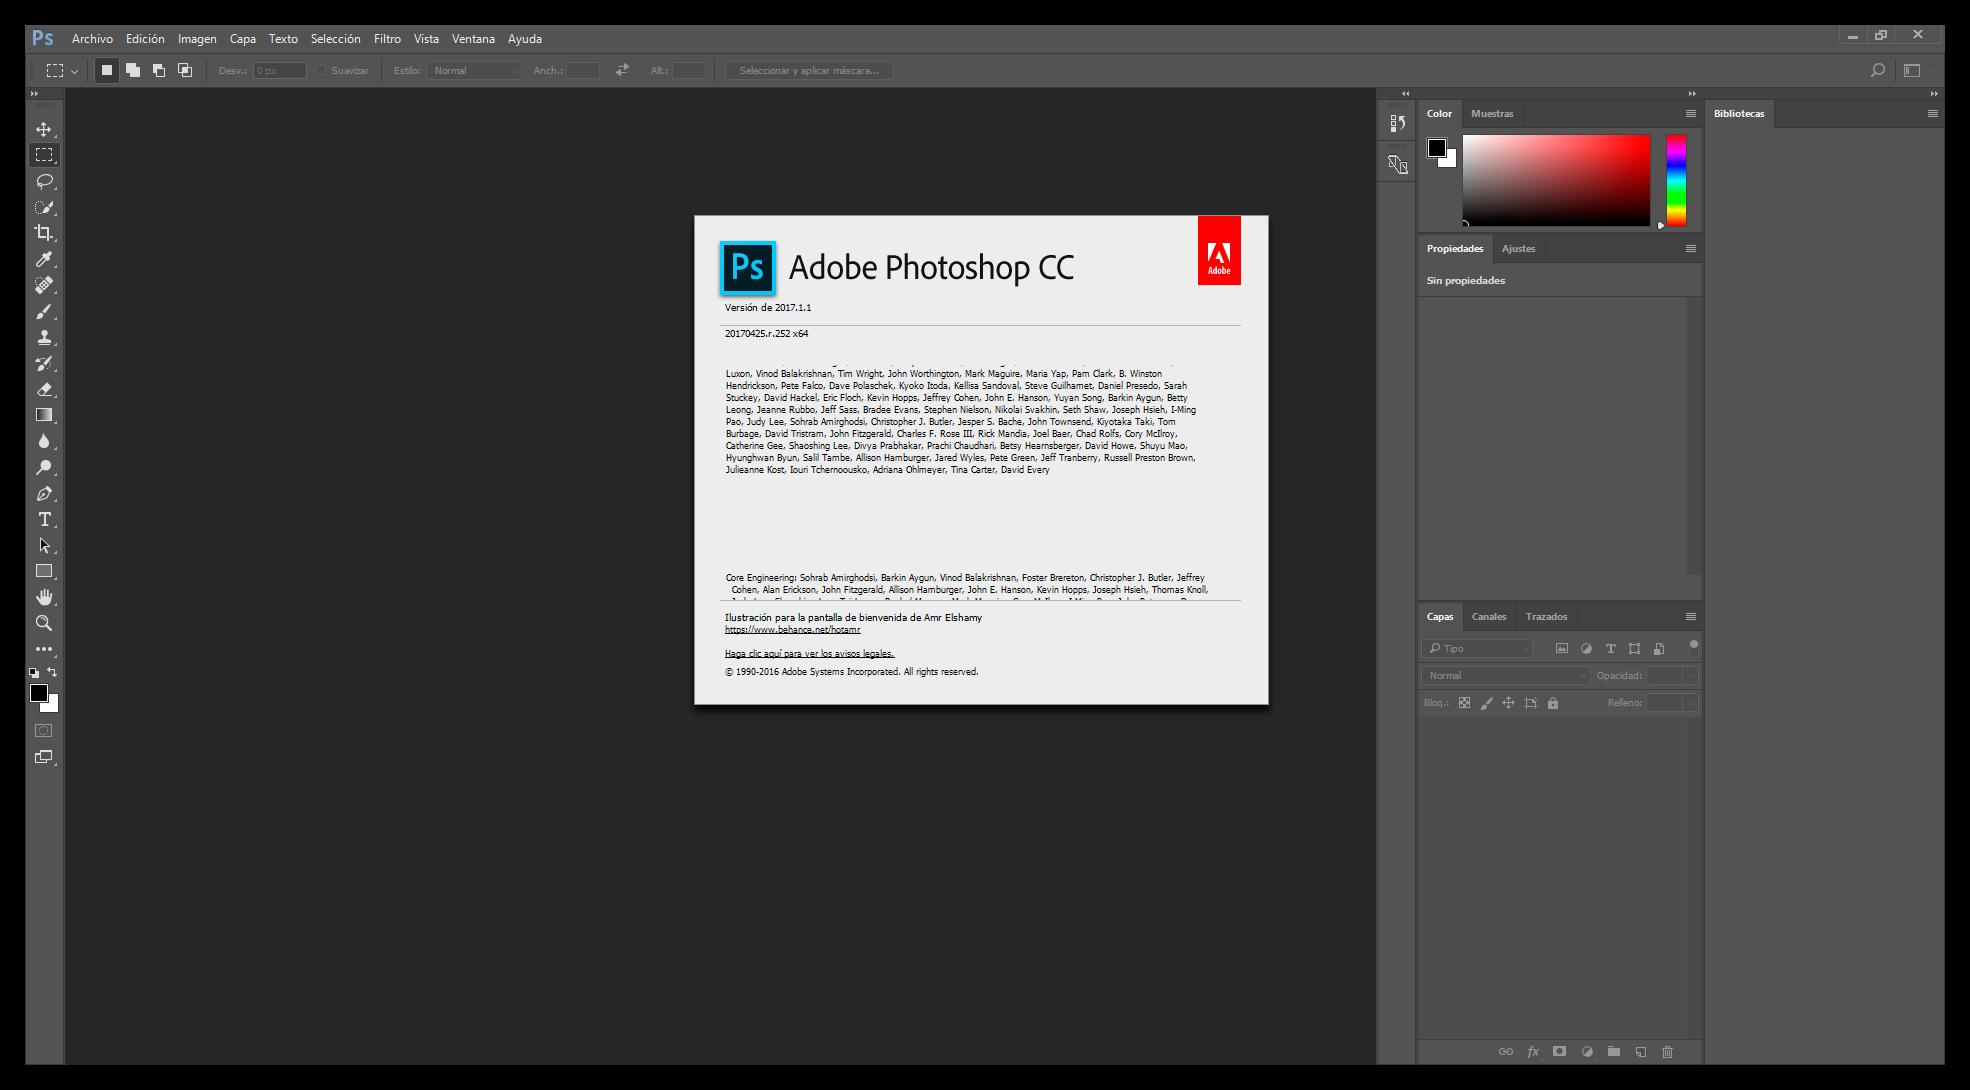 [Image: Activar-Adobe-Photoshop-CC-2017.png]